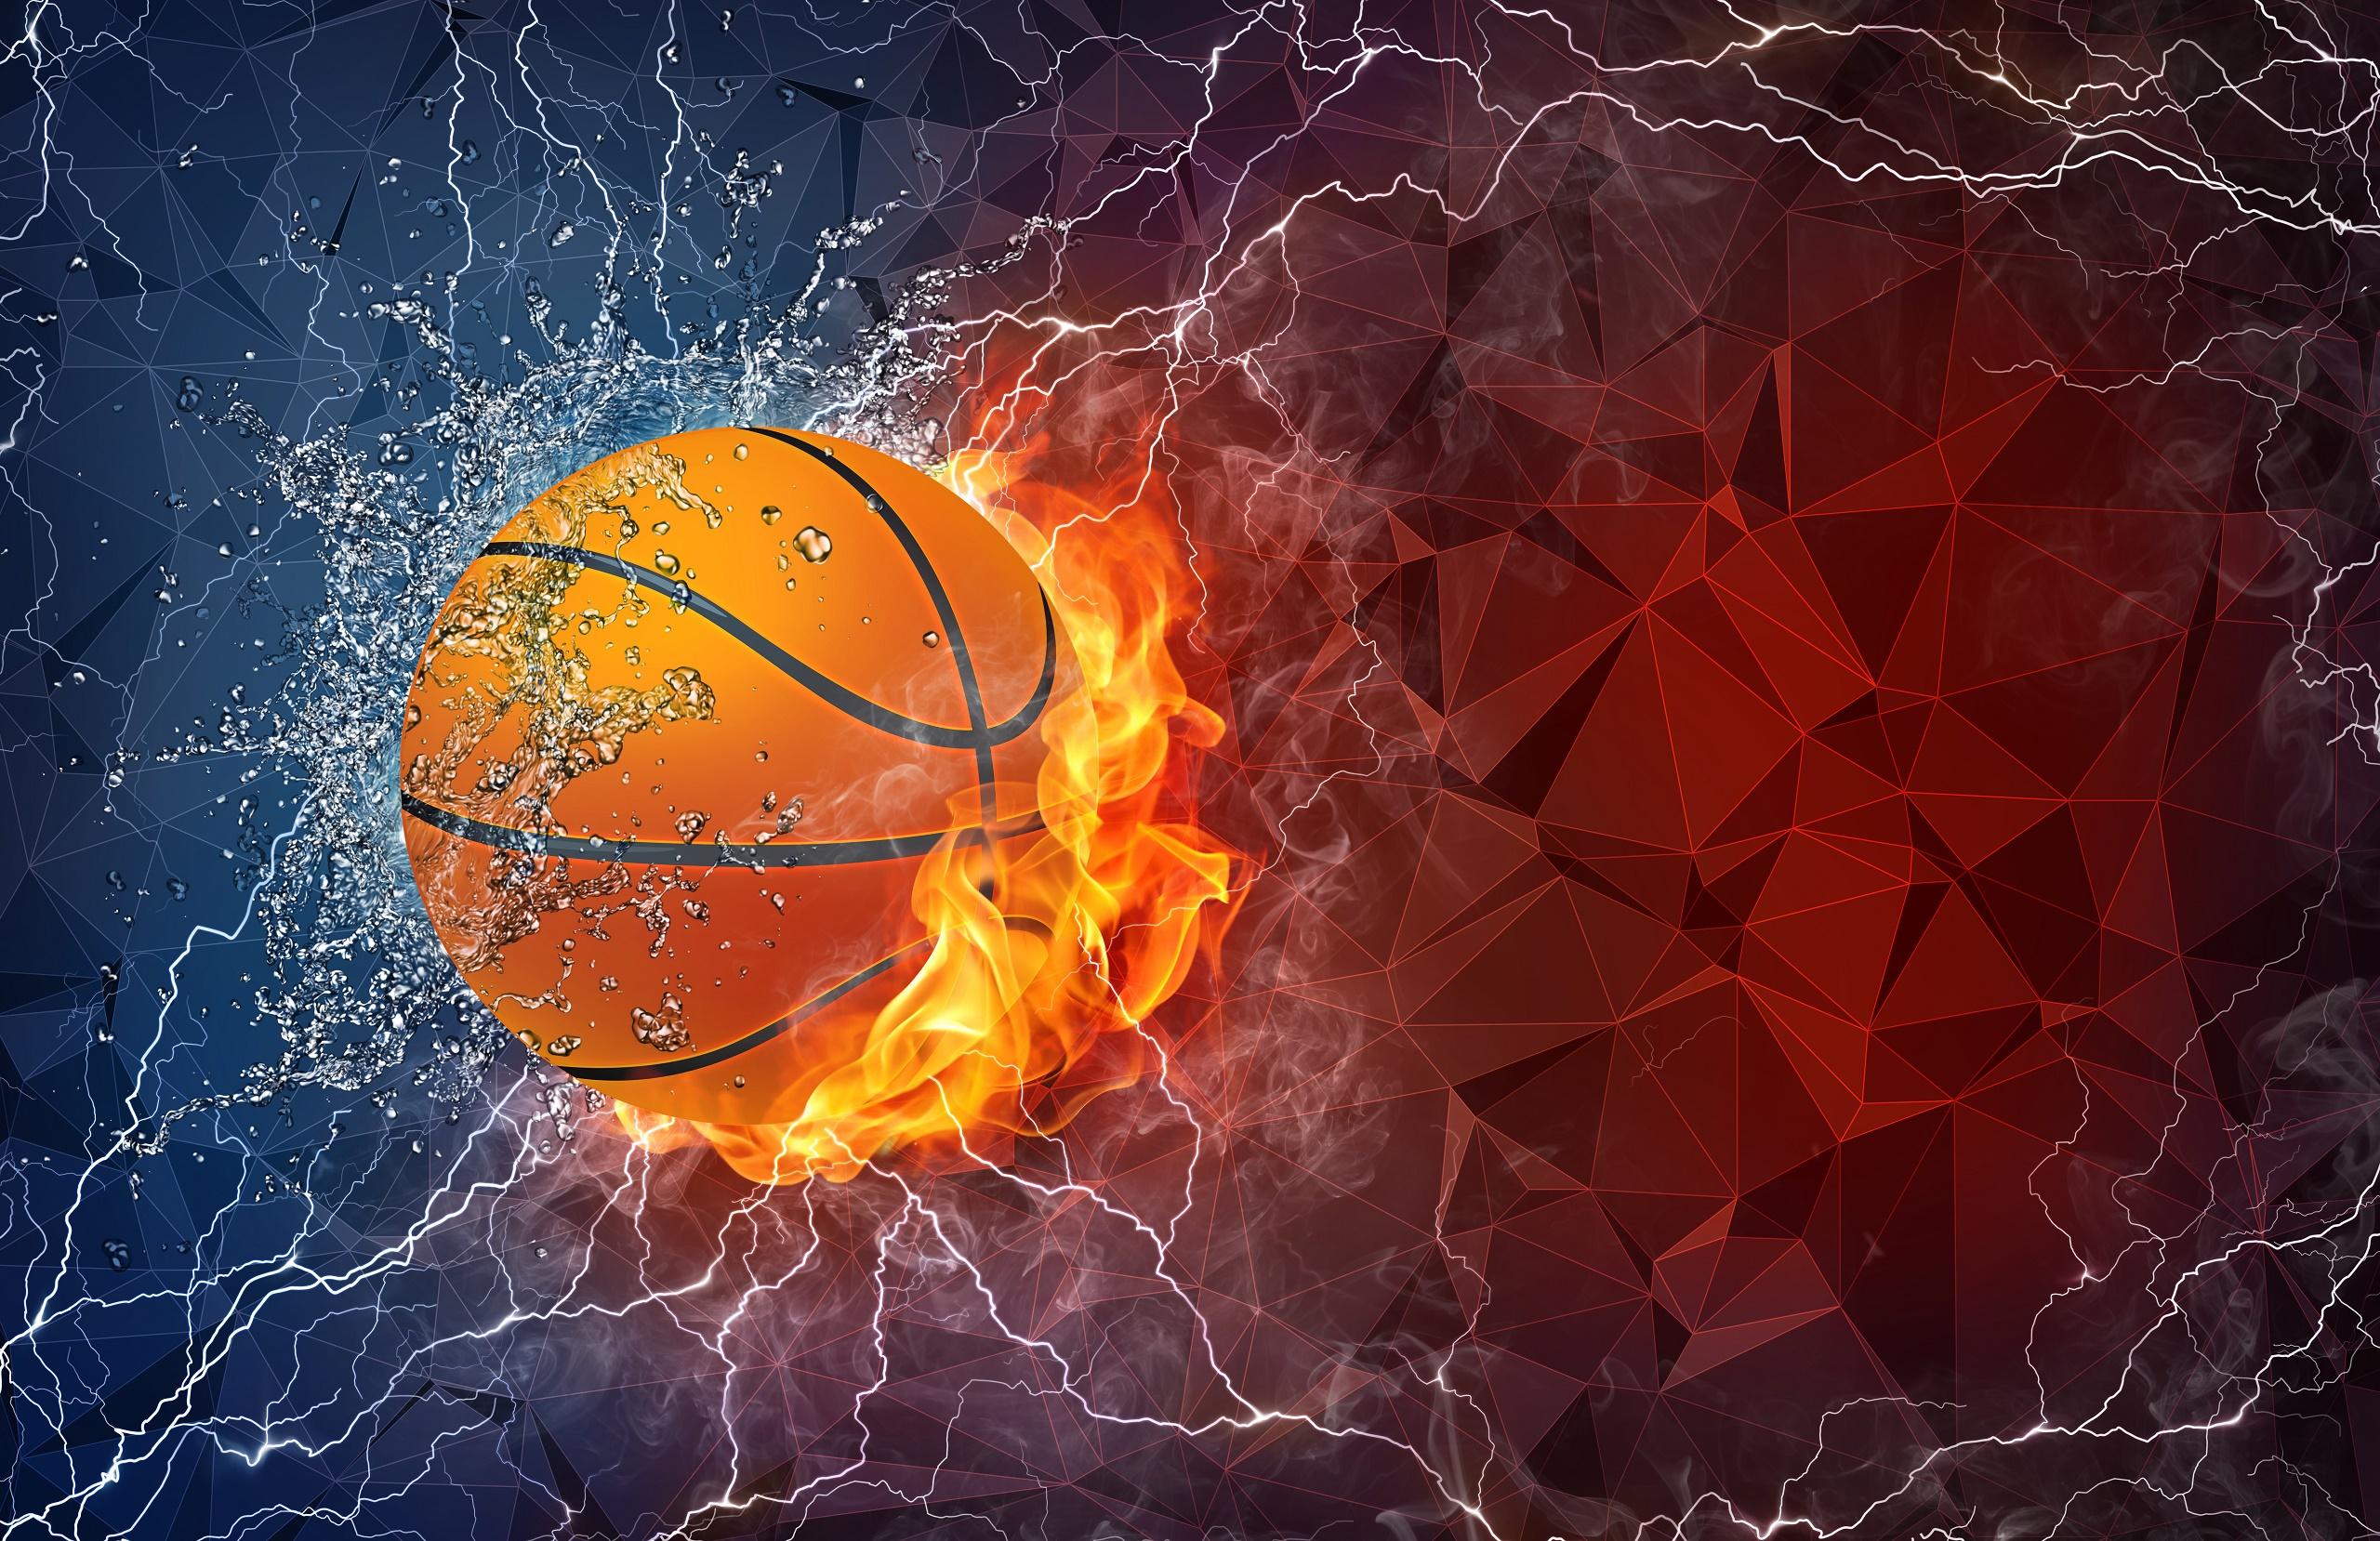 Nike Basketball Hd Wallpaper Basketball Wallpapers Hd Pixelstalk Net